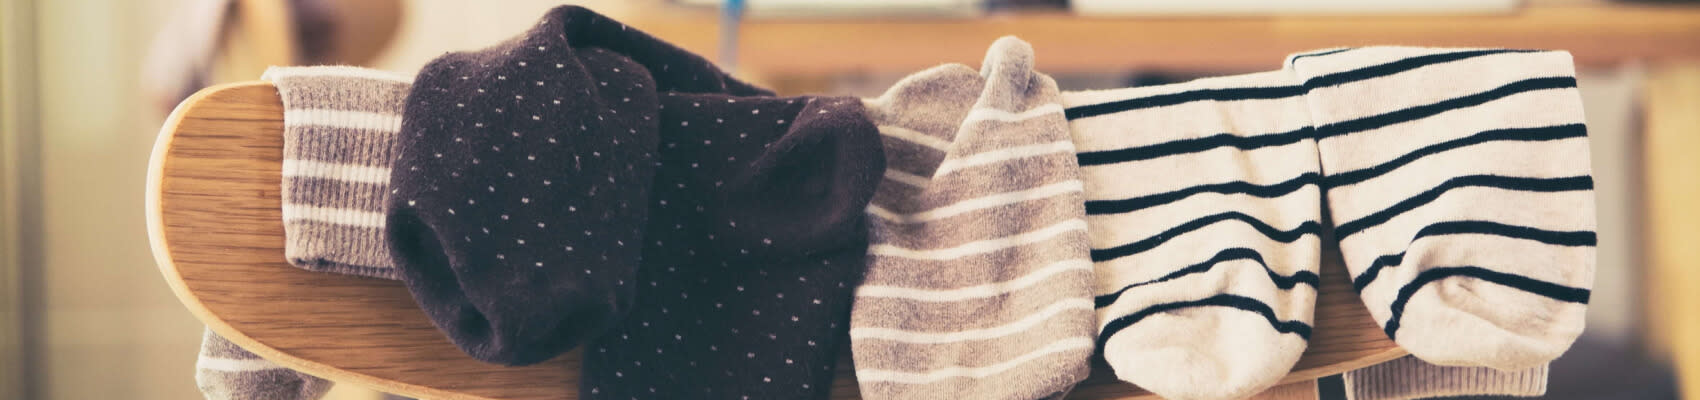 Freshy laundered socks on a chair